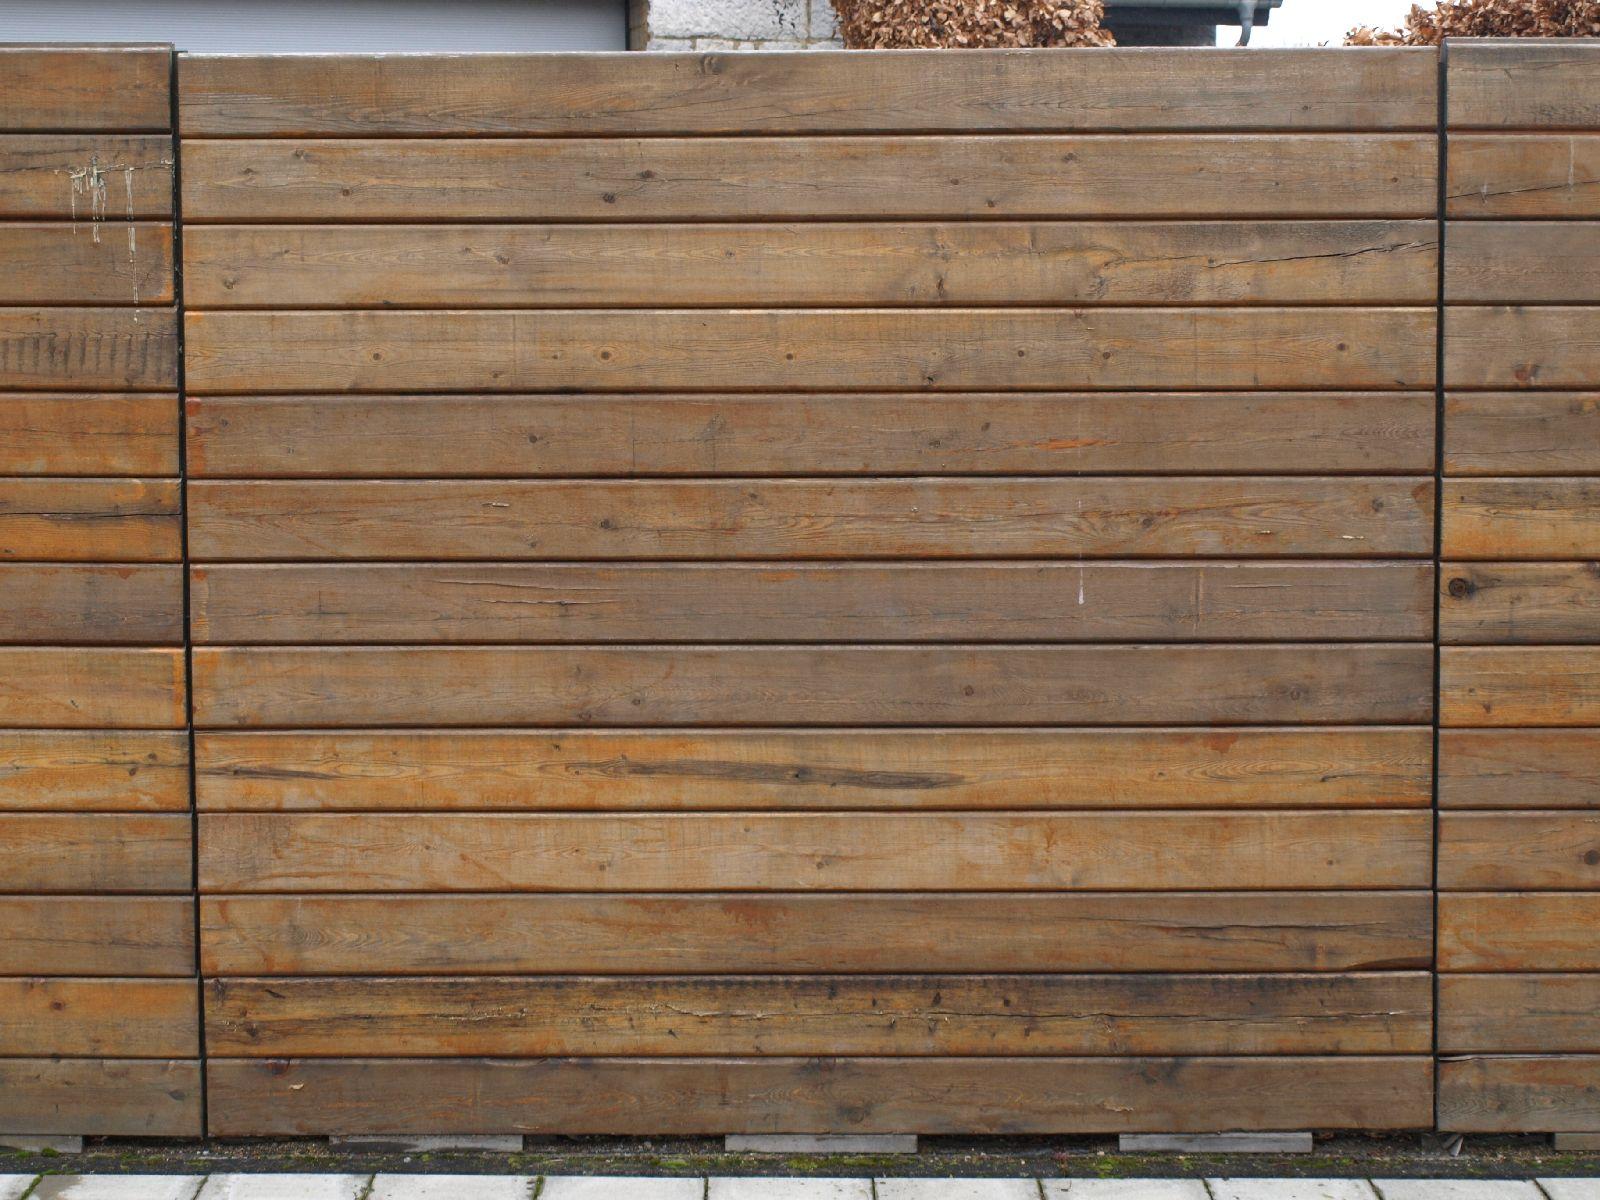 Wood_Texture_A_P2080534